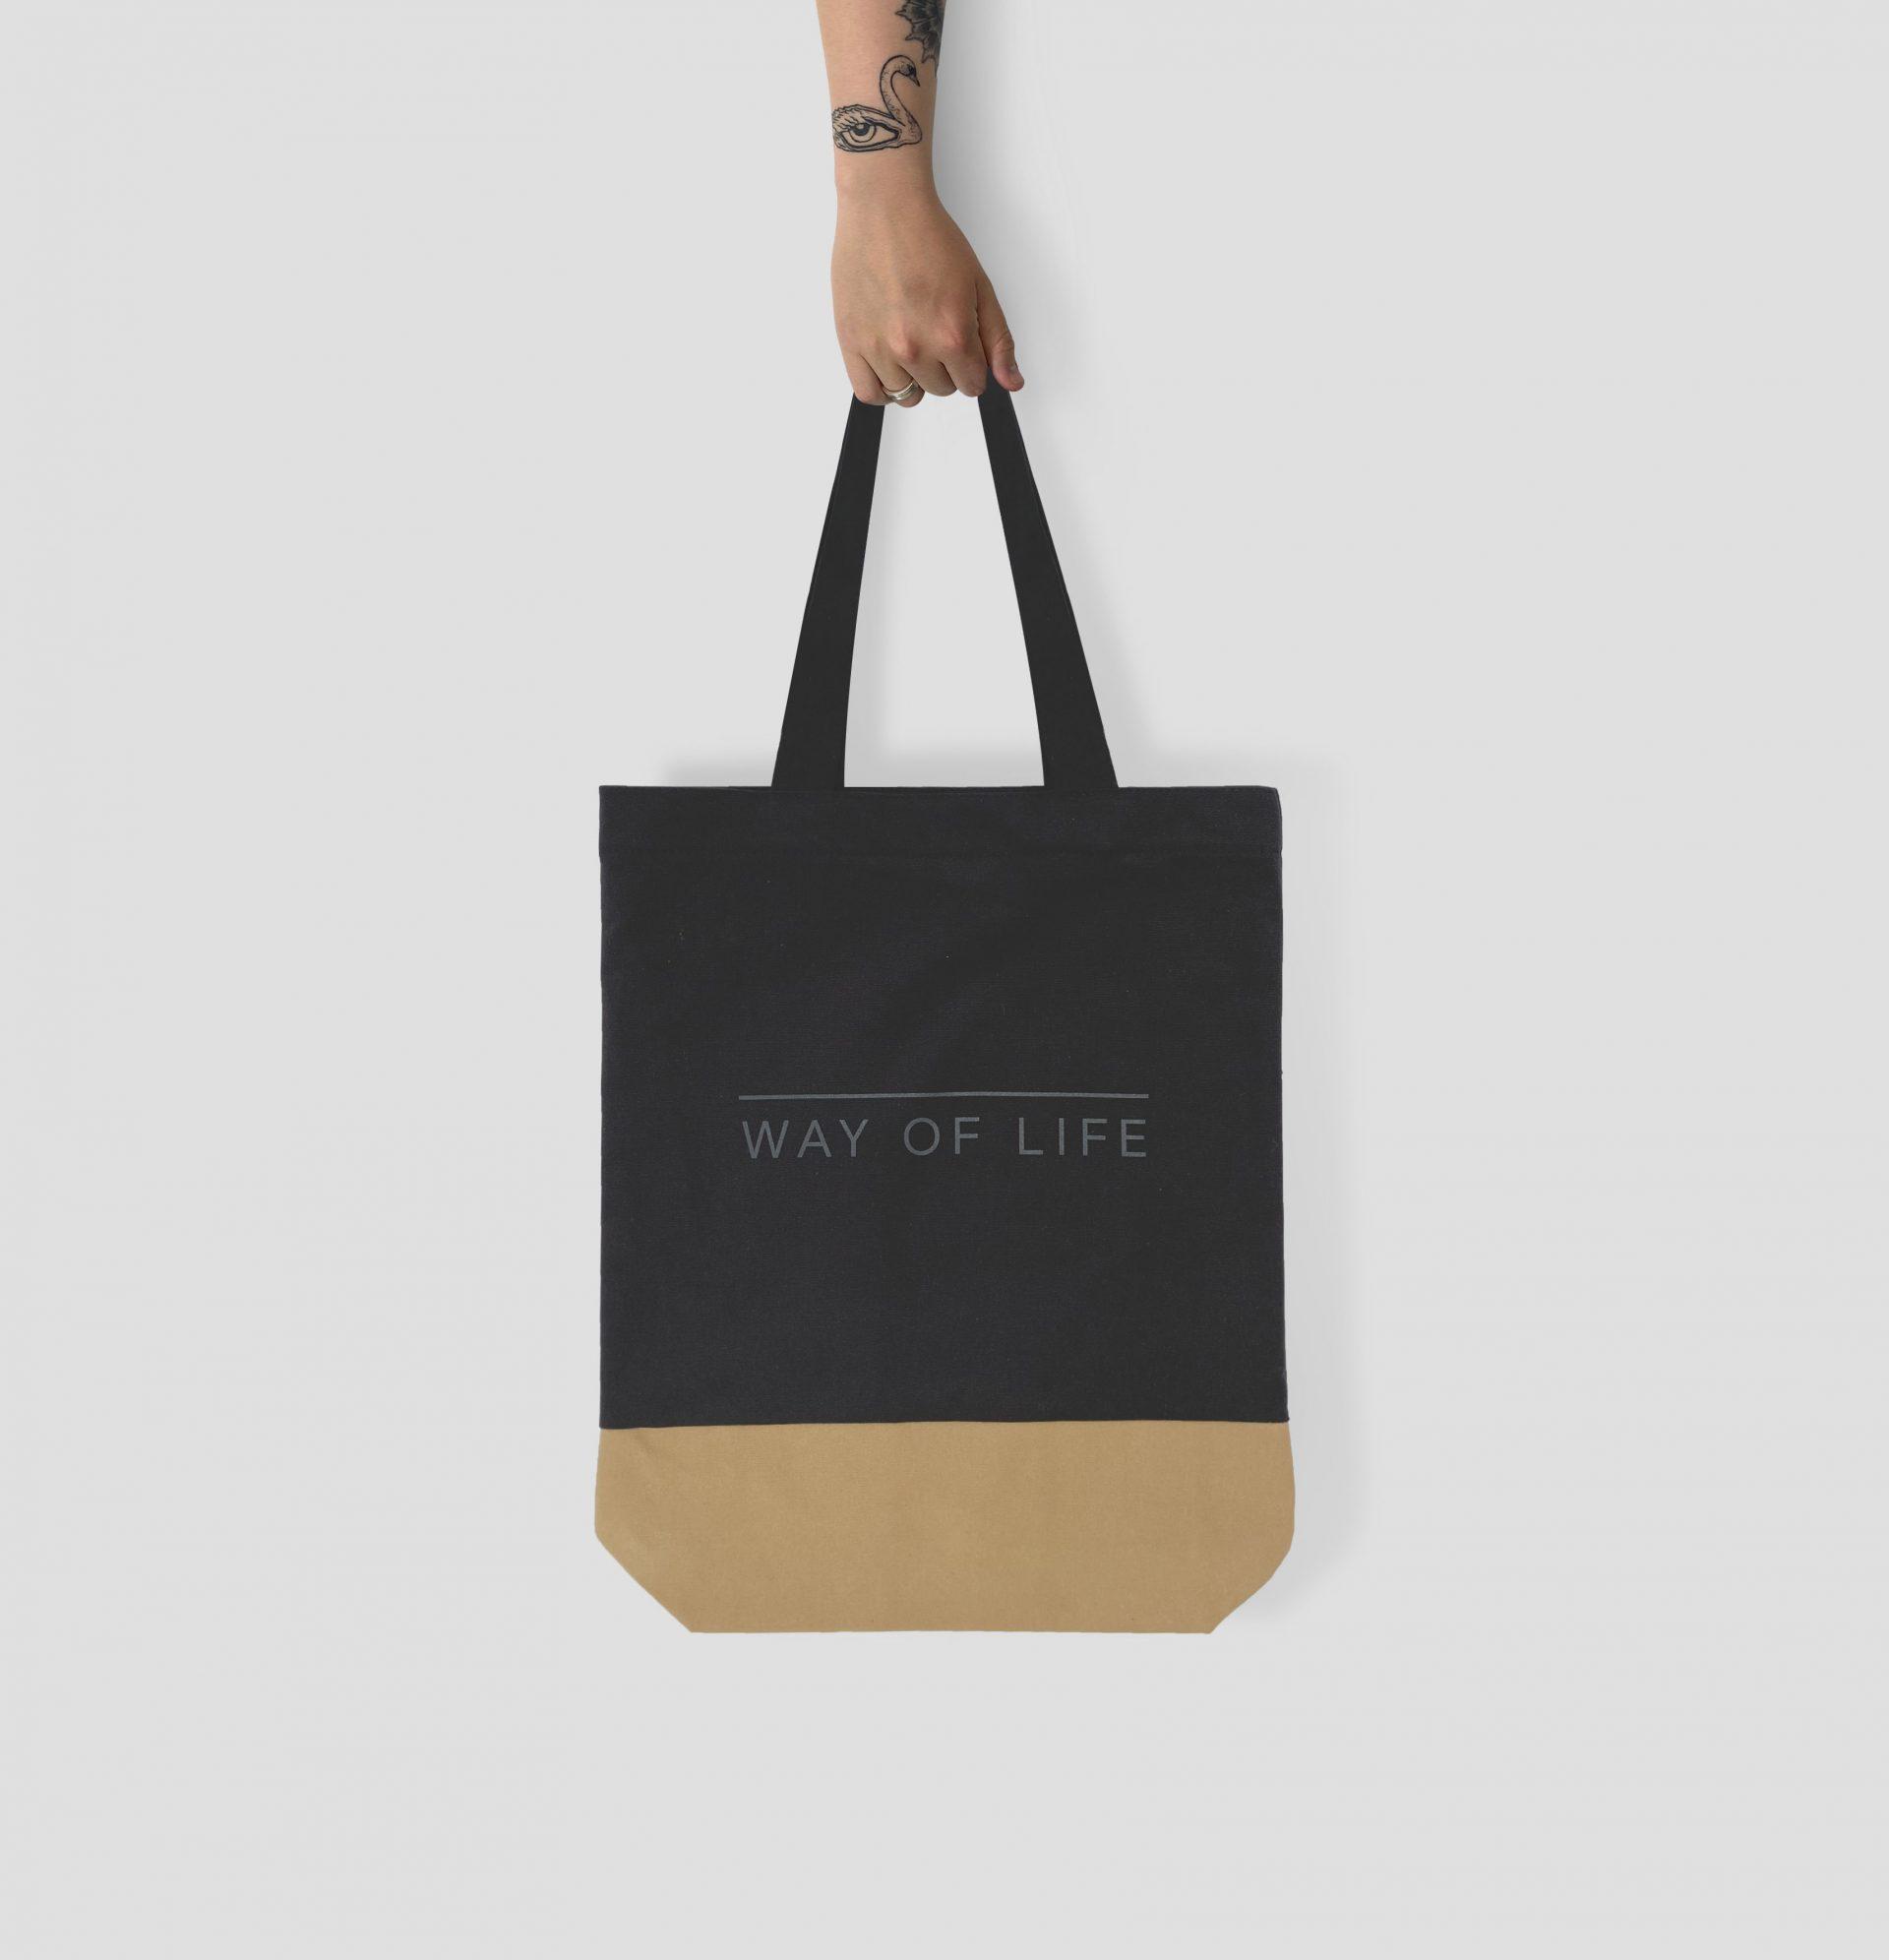 Here Designs tote bag